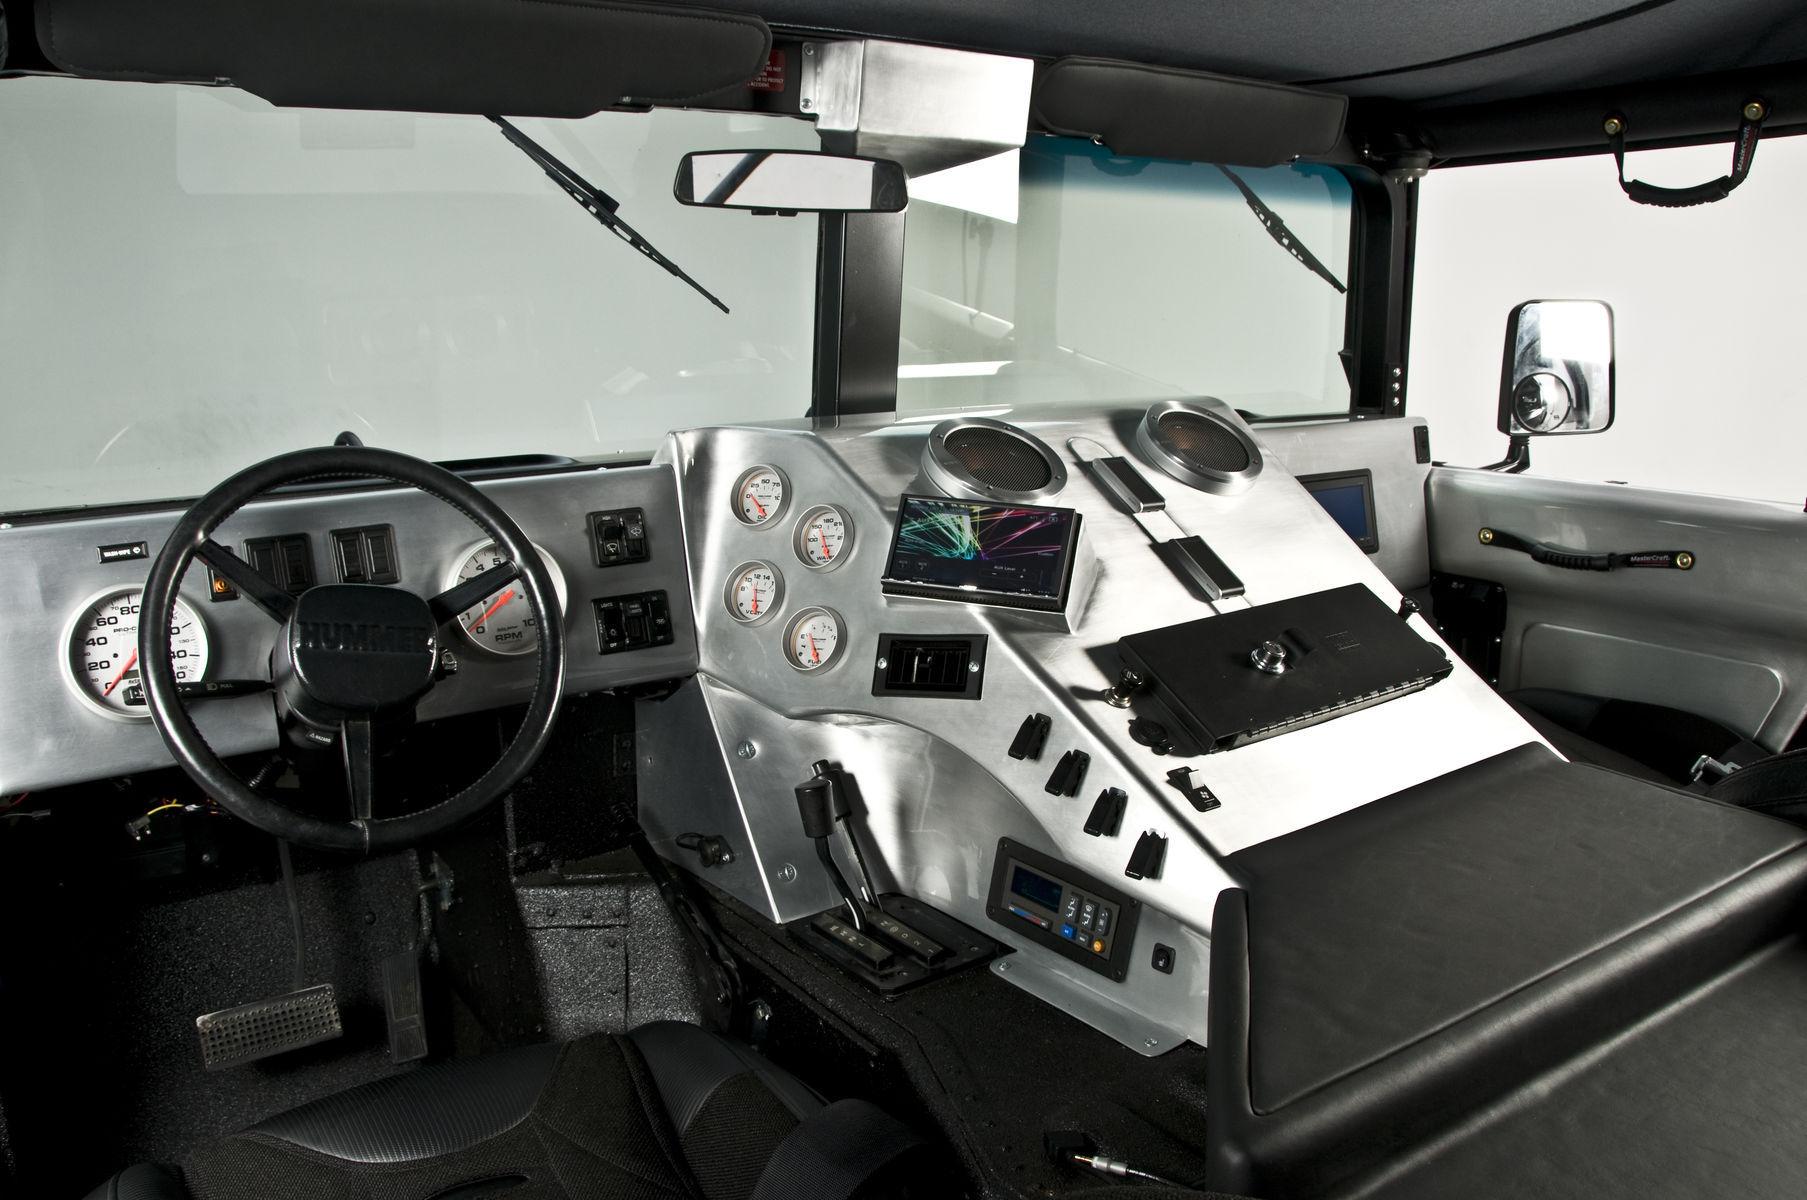 2006 HUMMER H1 | RCH Designs Custom Built Hummer H1   Interior View Images